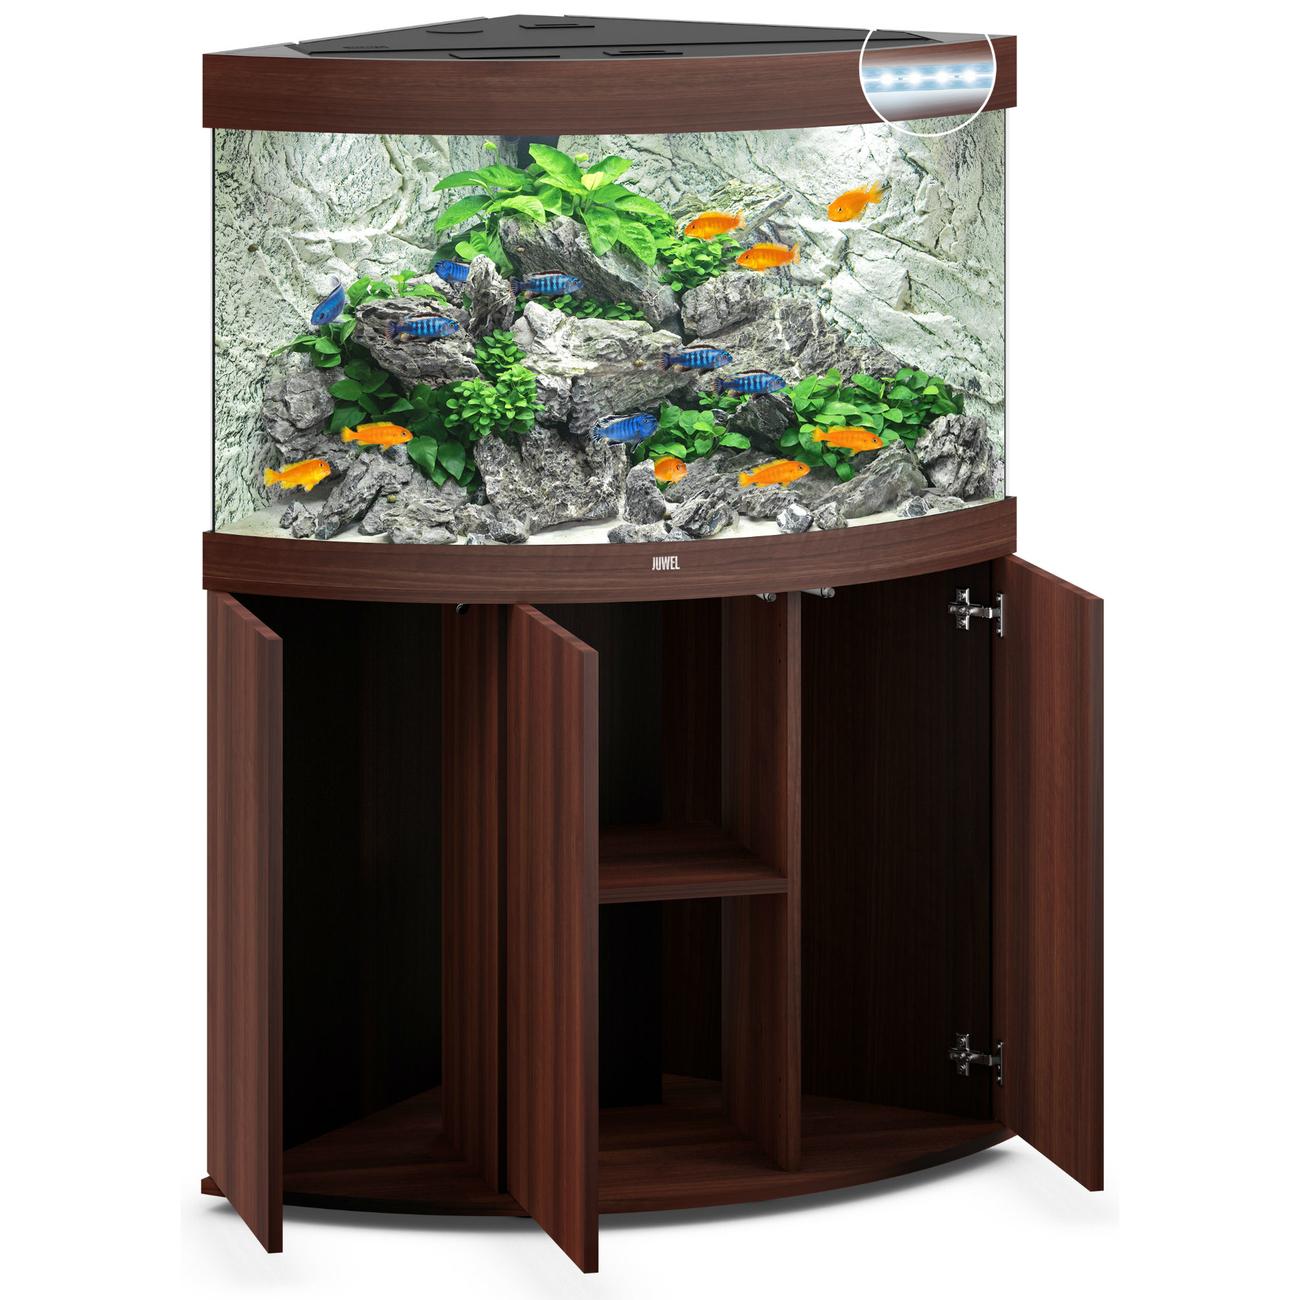 Juwel Trigon 190 LED Eck-Aquarium mit Unterschrank Bild 16